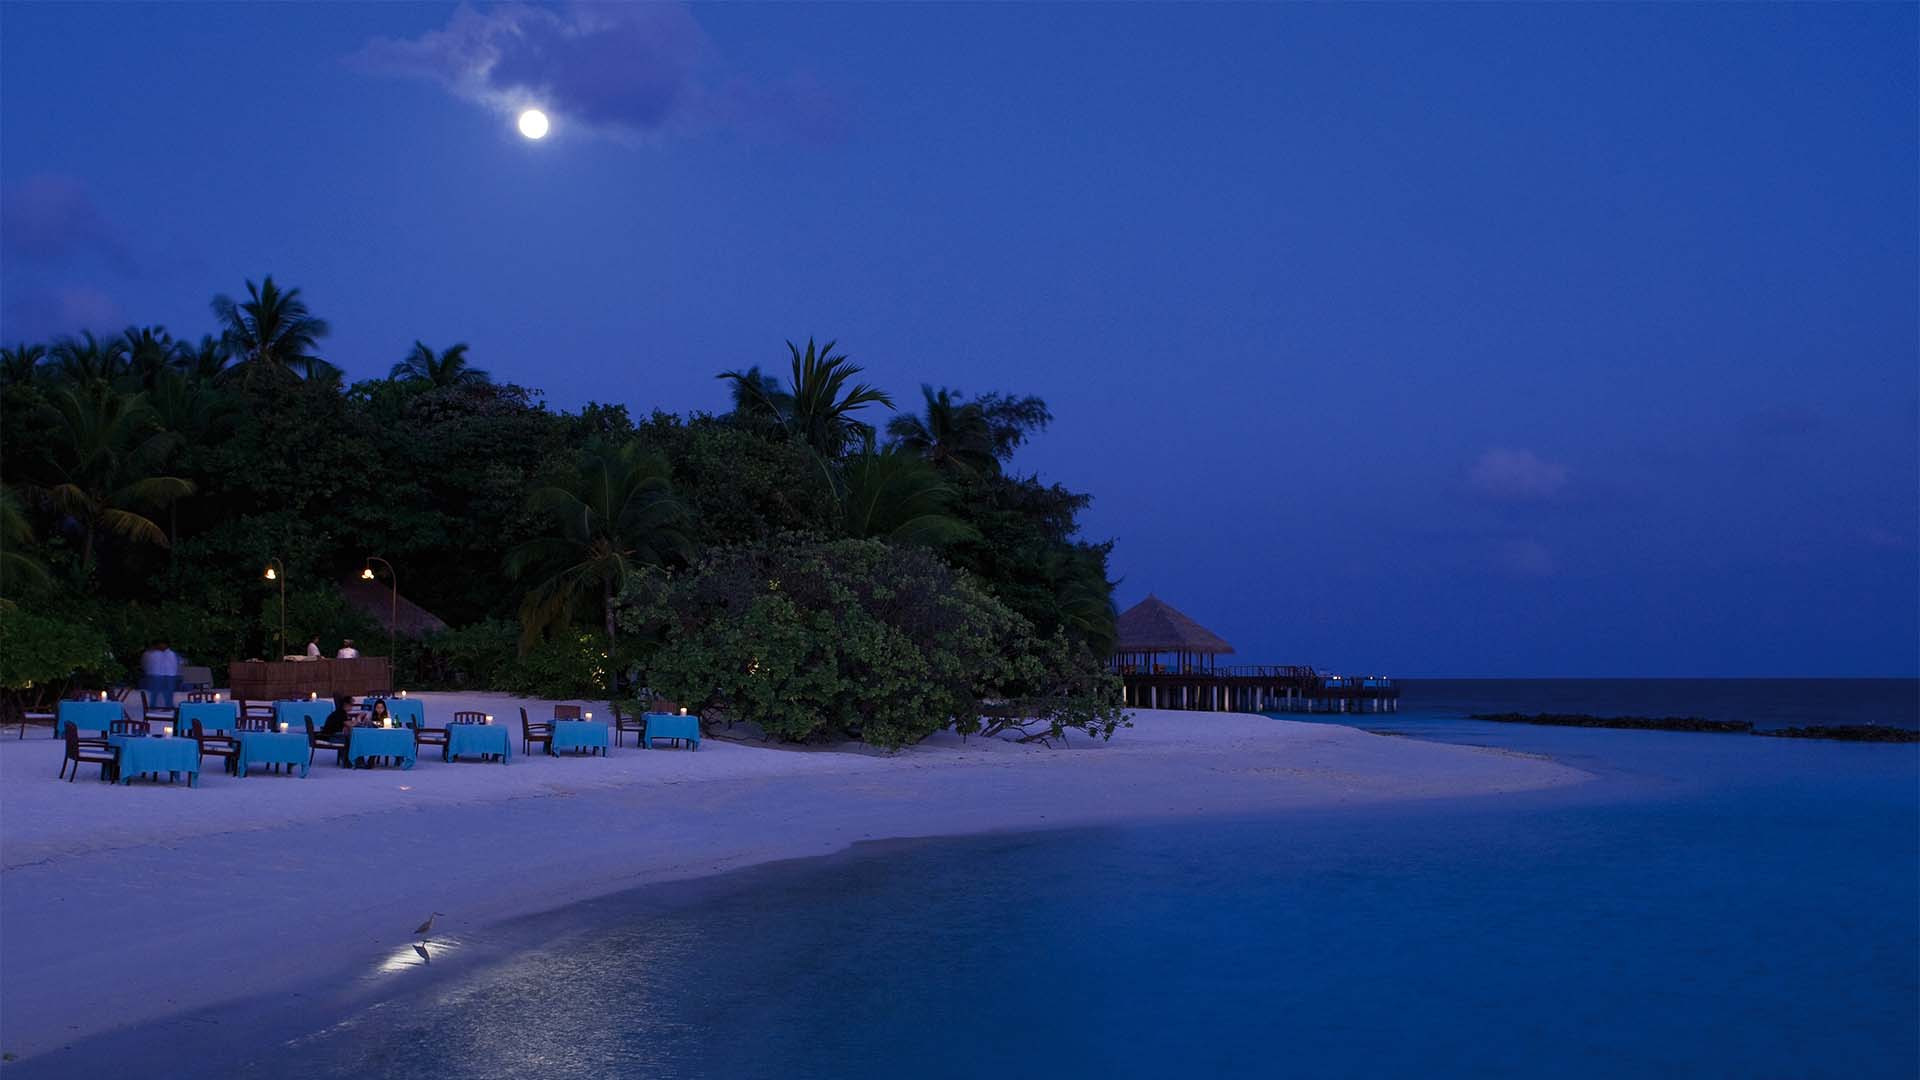 Beach at Coco Bodu Hithi Maldives